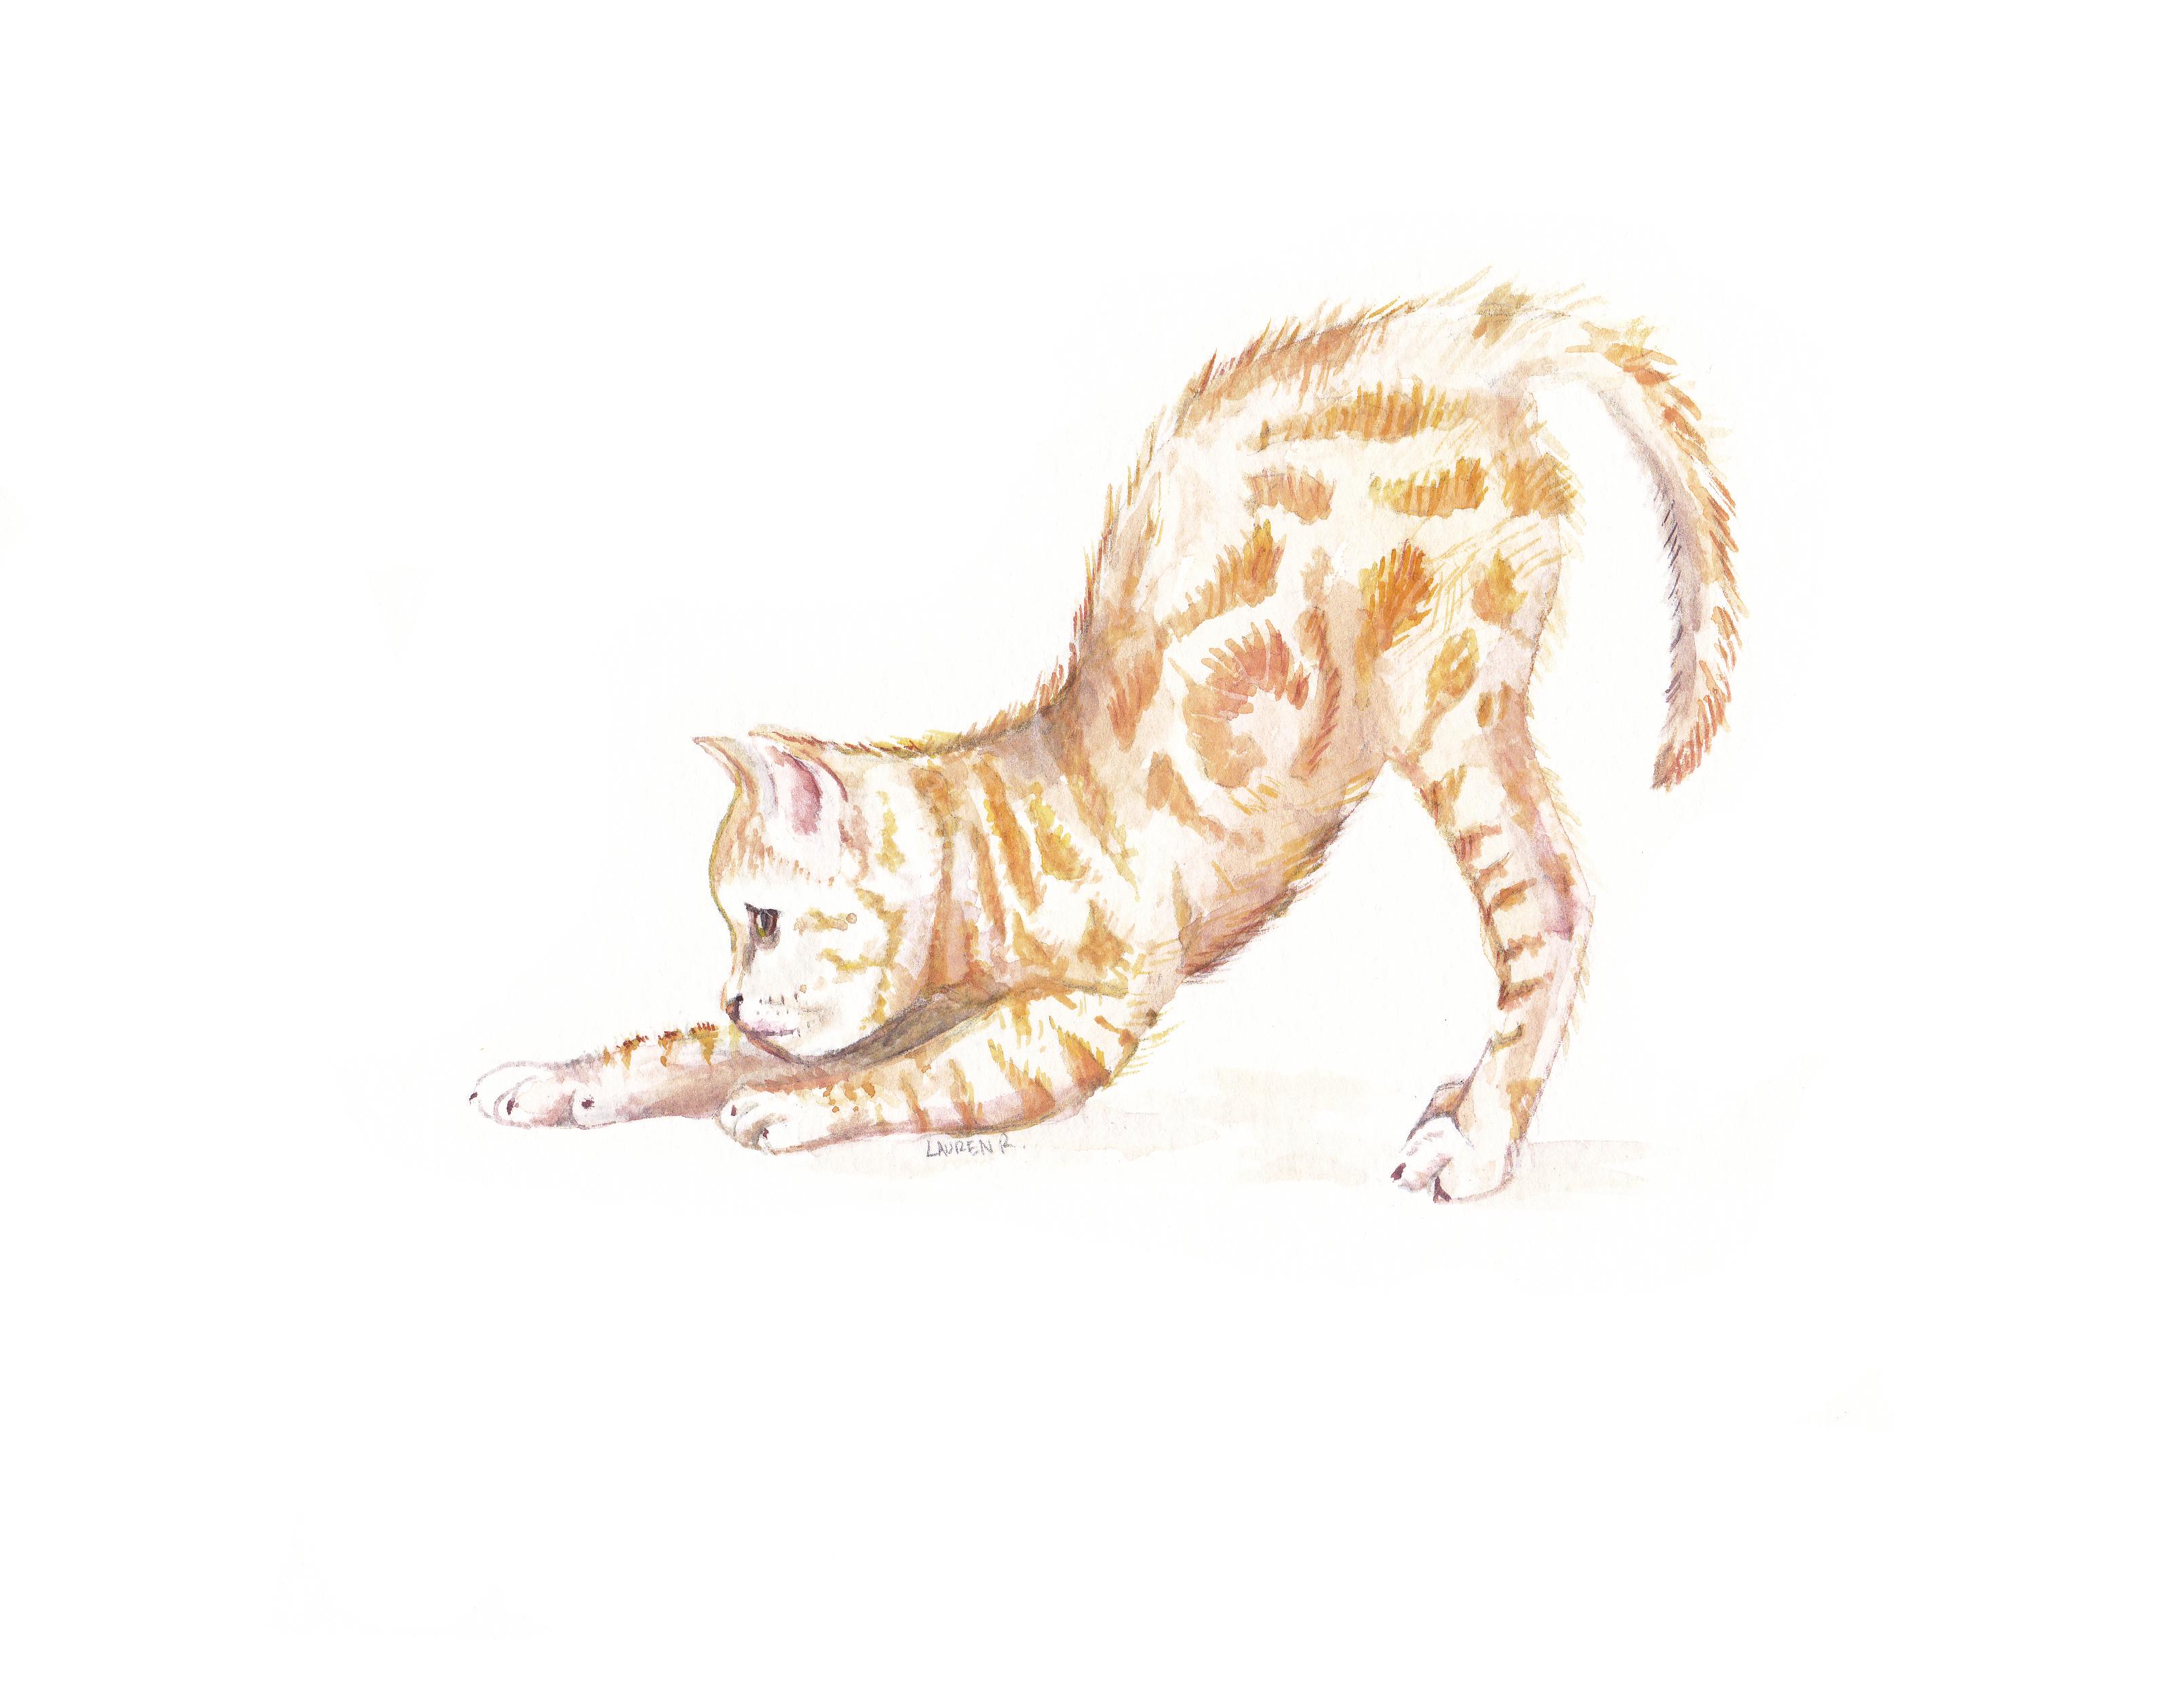 catstretch8.5x11.jpg